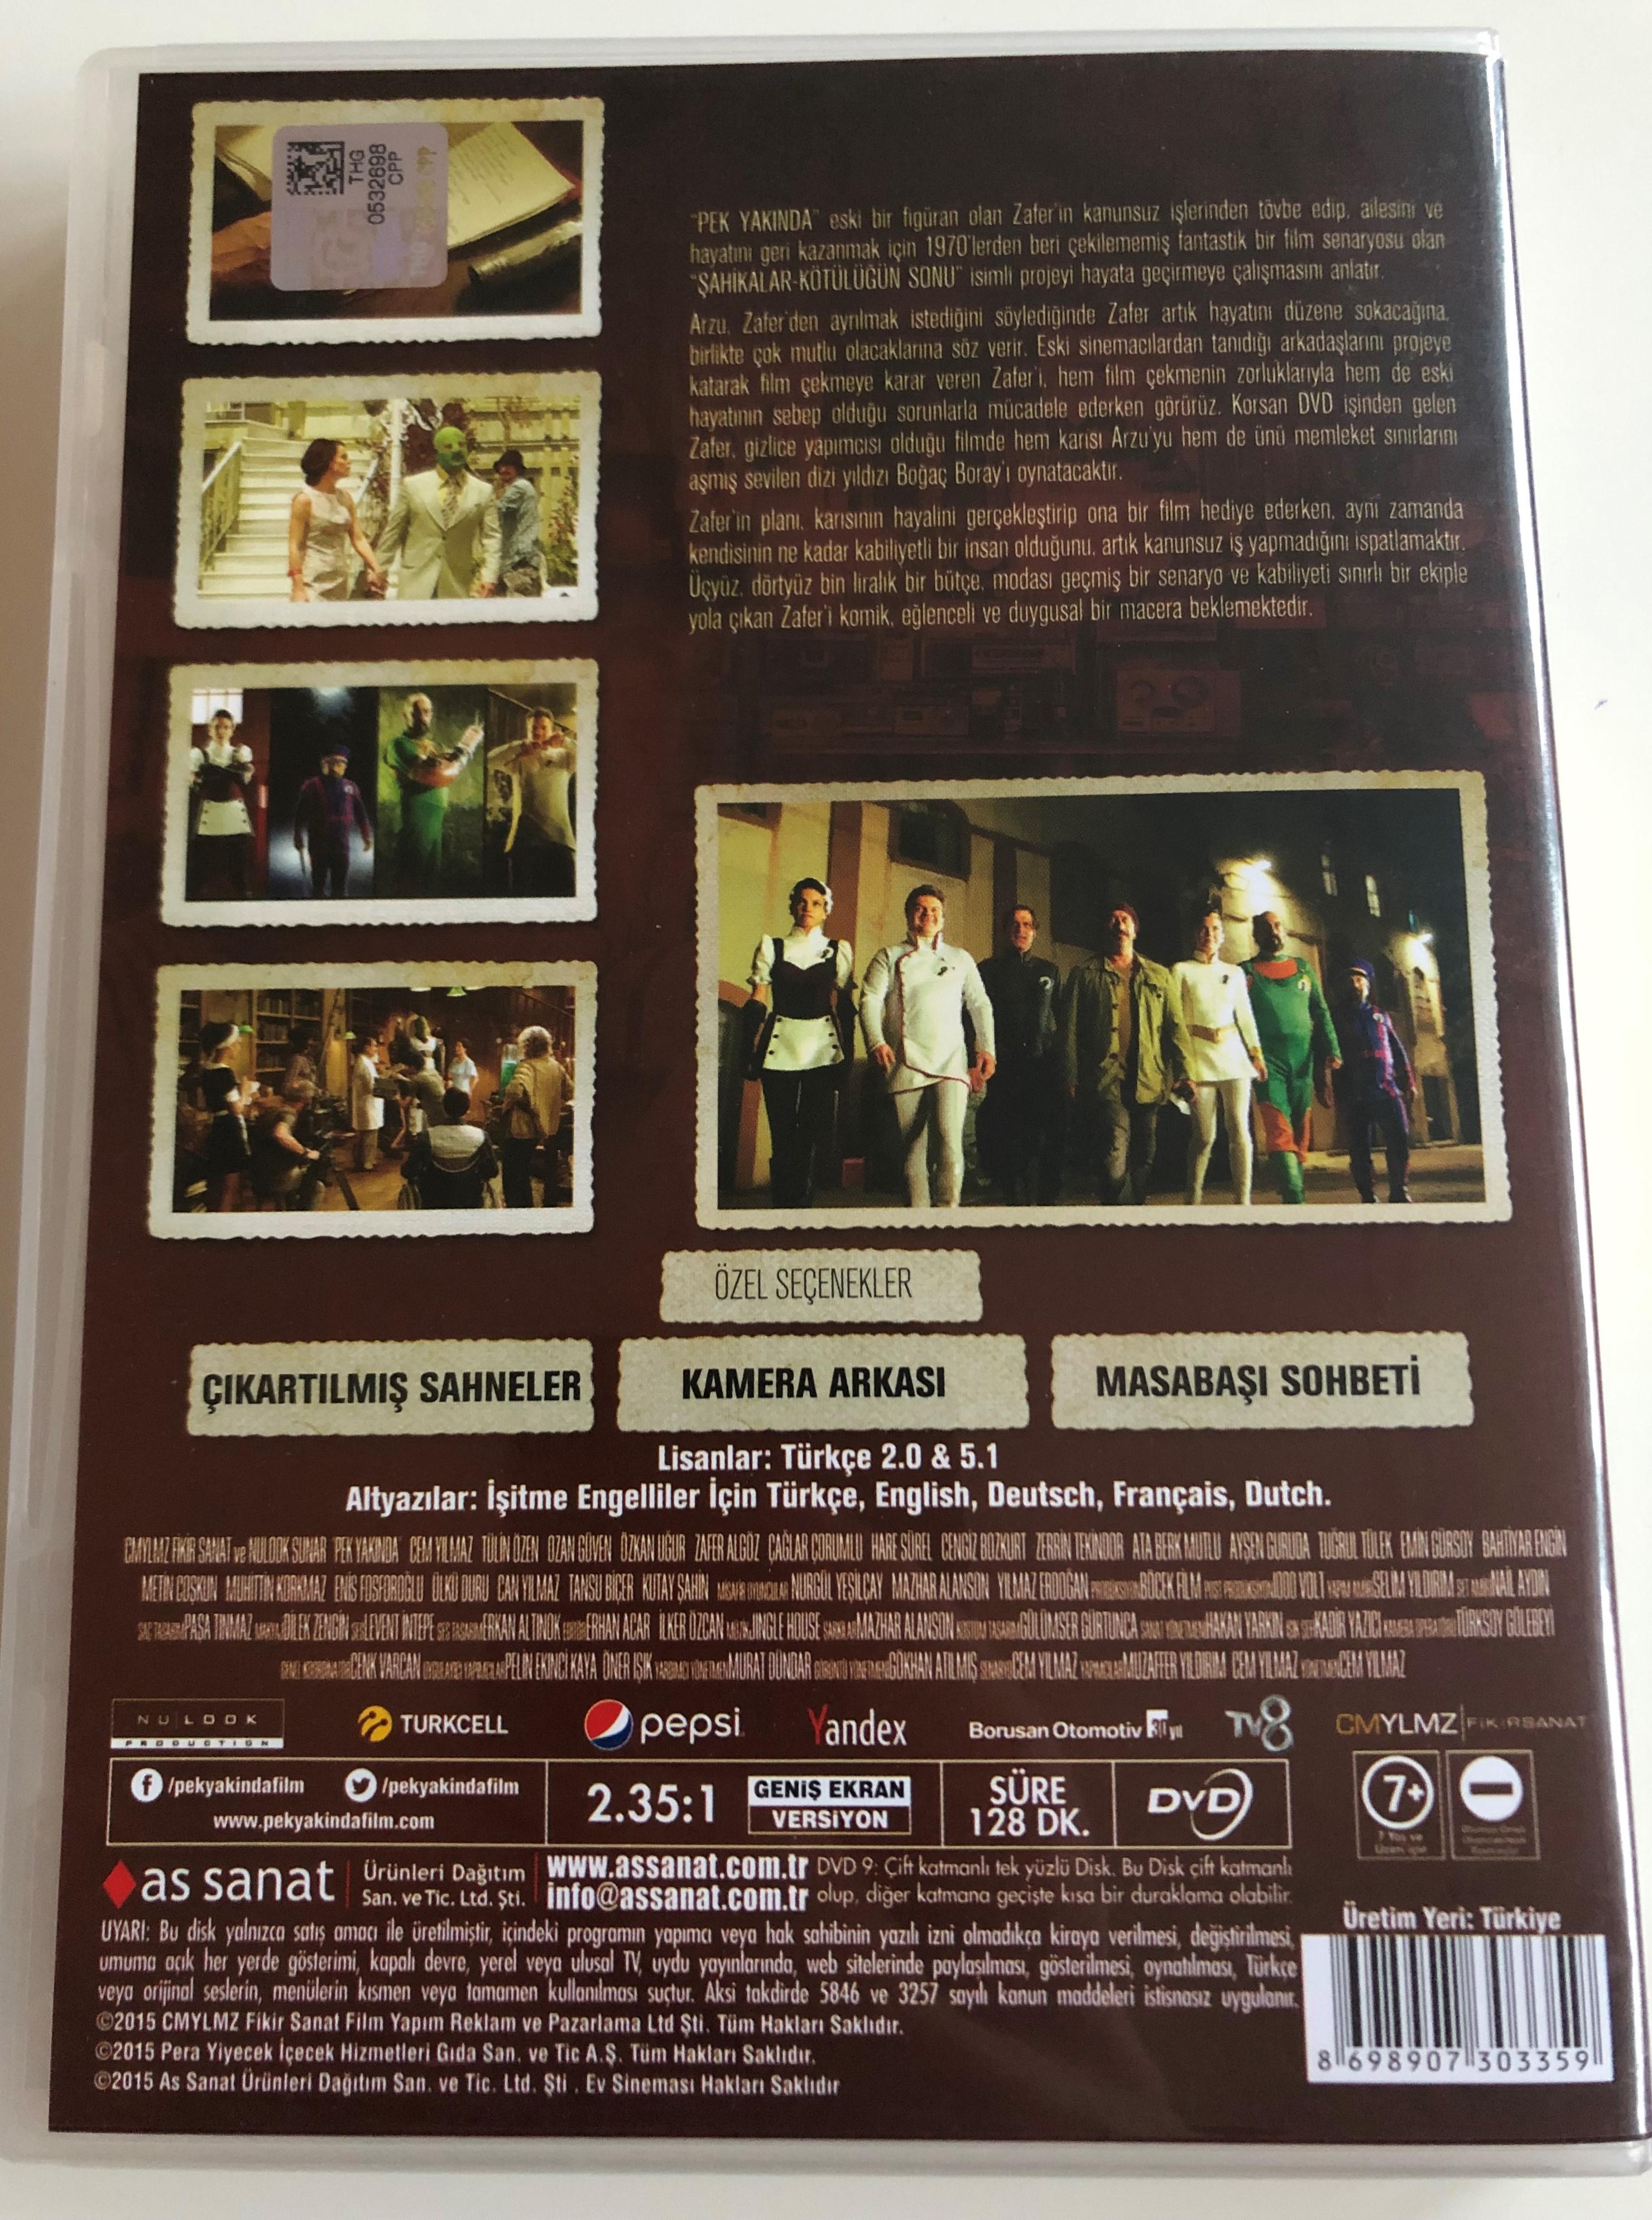 pek-yakinda-dvd-2014-coming-soon-directed-by-cem-y-lmaz-starring-cem-y-lmaz-t-lin-zen-ozan-g-ven-zkan-u-ur-2-.jpg